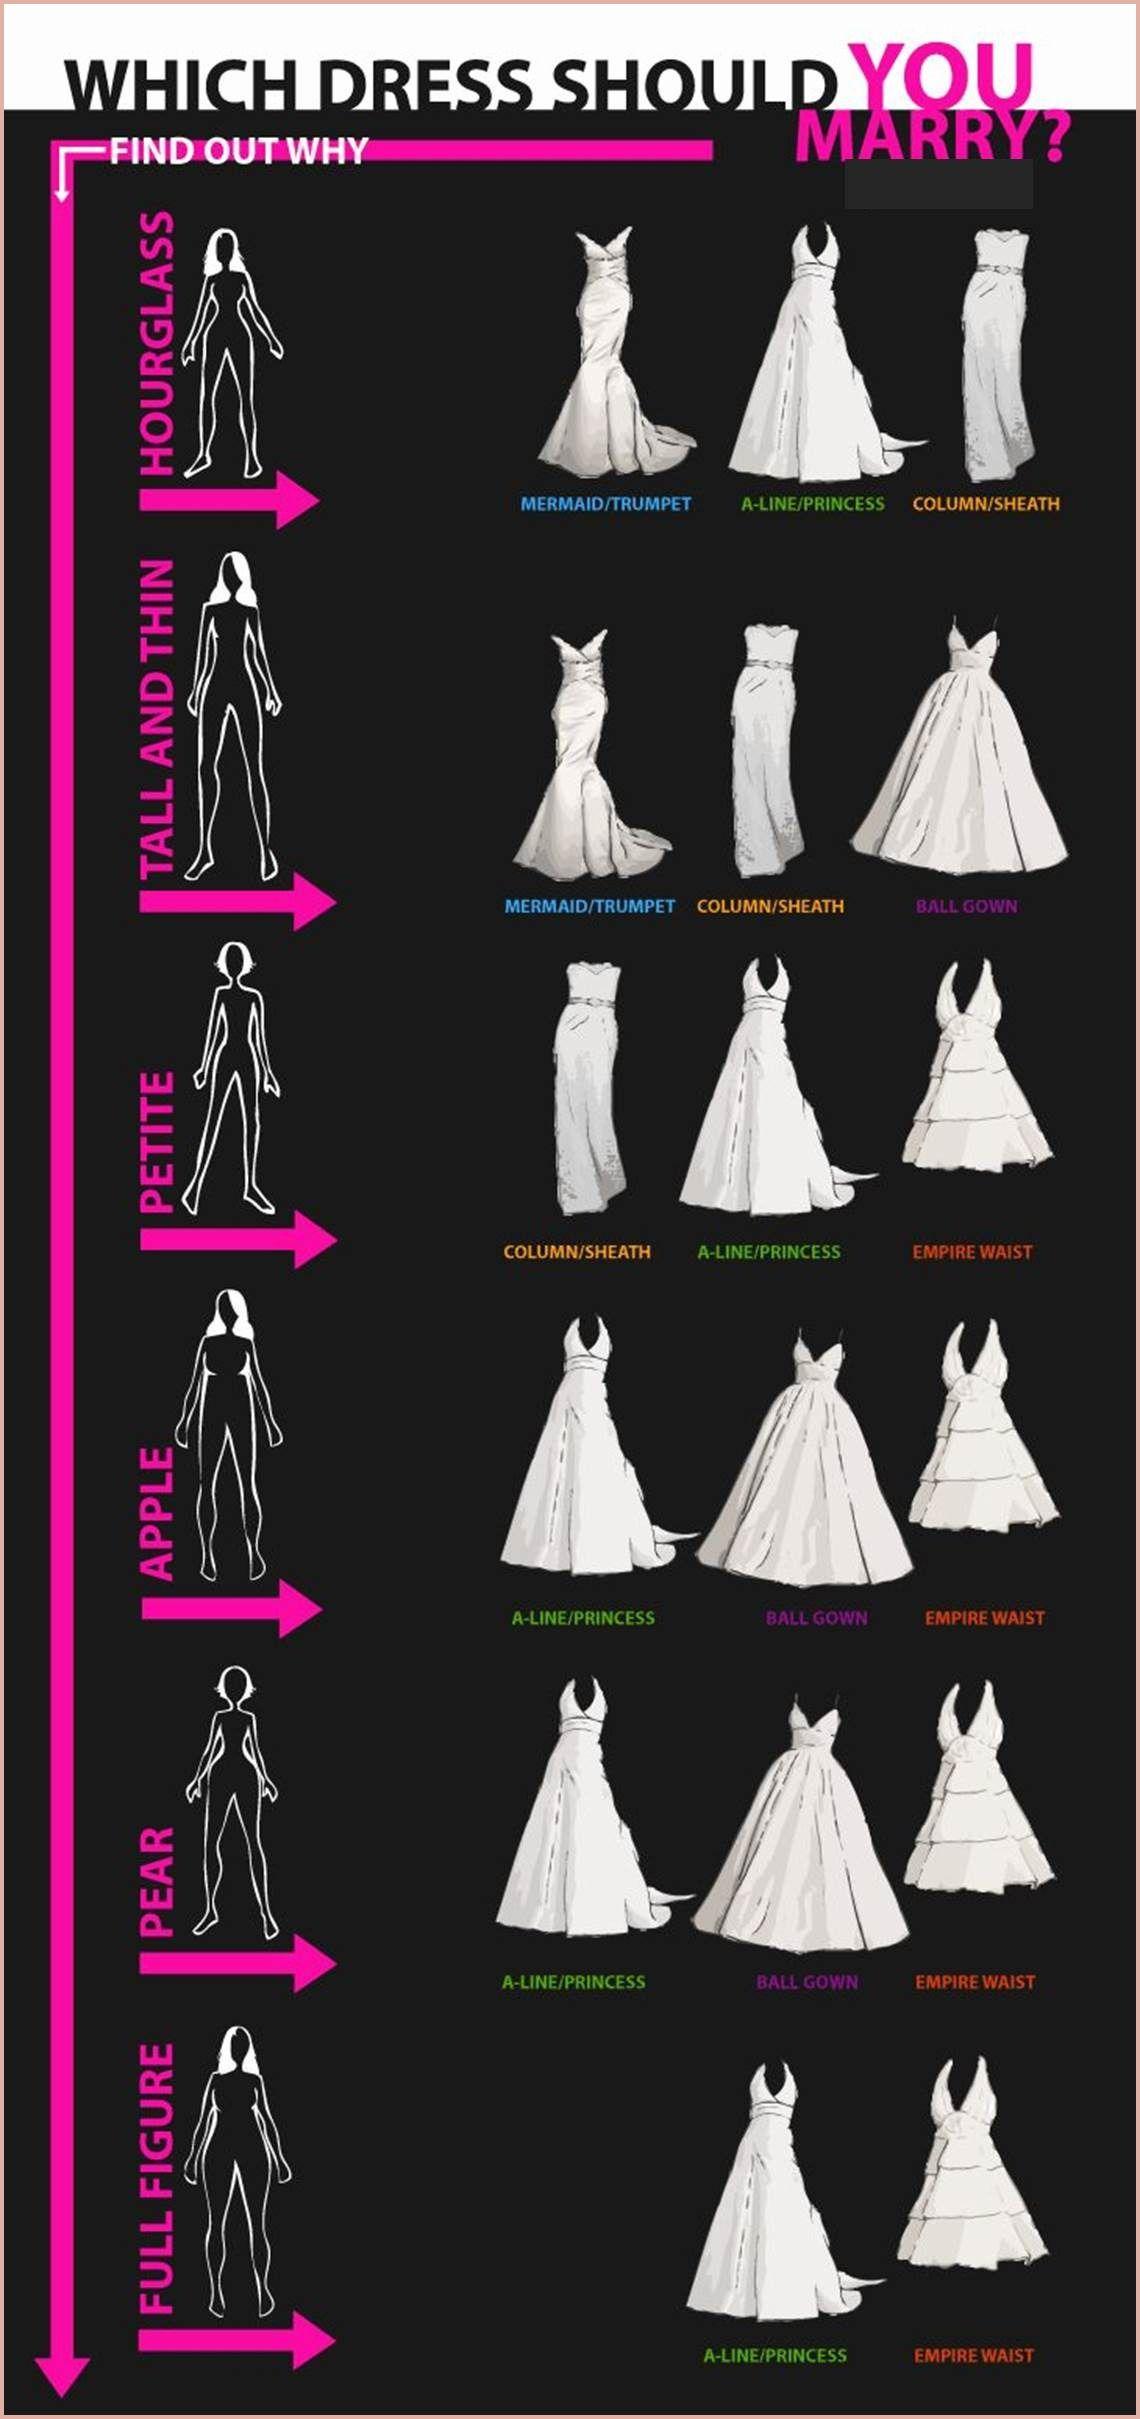 Best Wedding Dress For Your Body Wedding Dress Styles Dress Body Type Wedding Dress Body Type